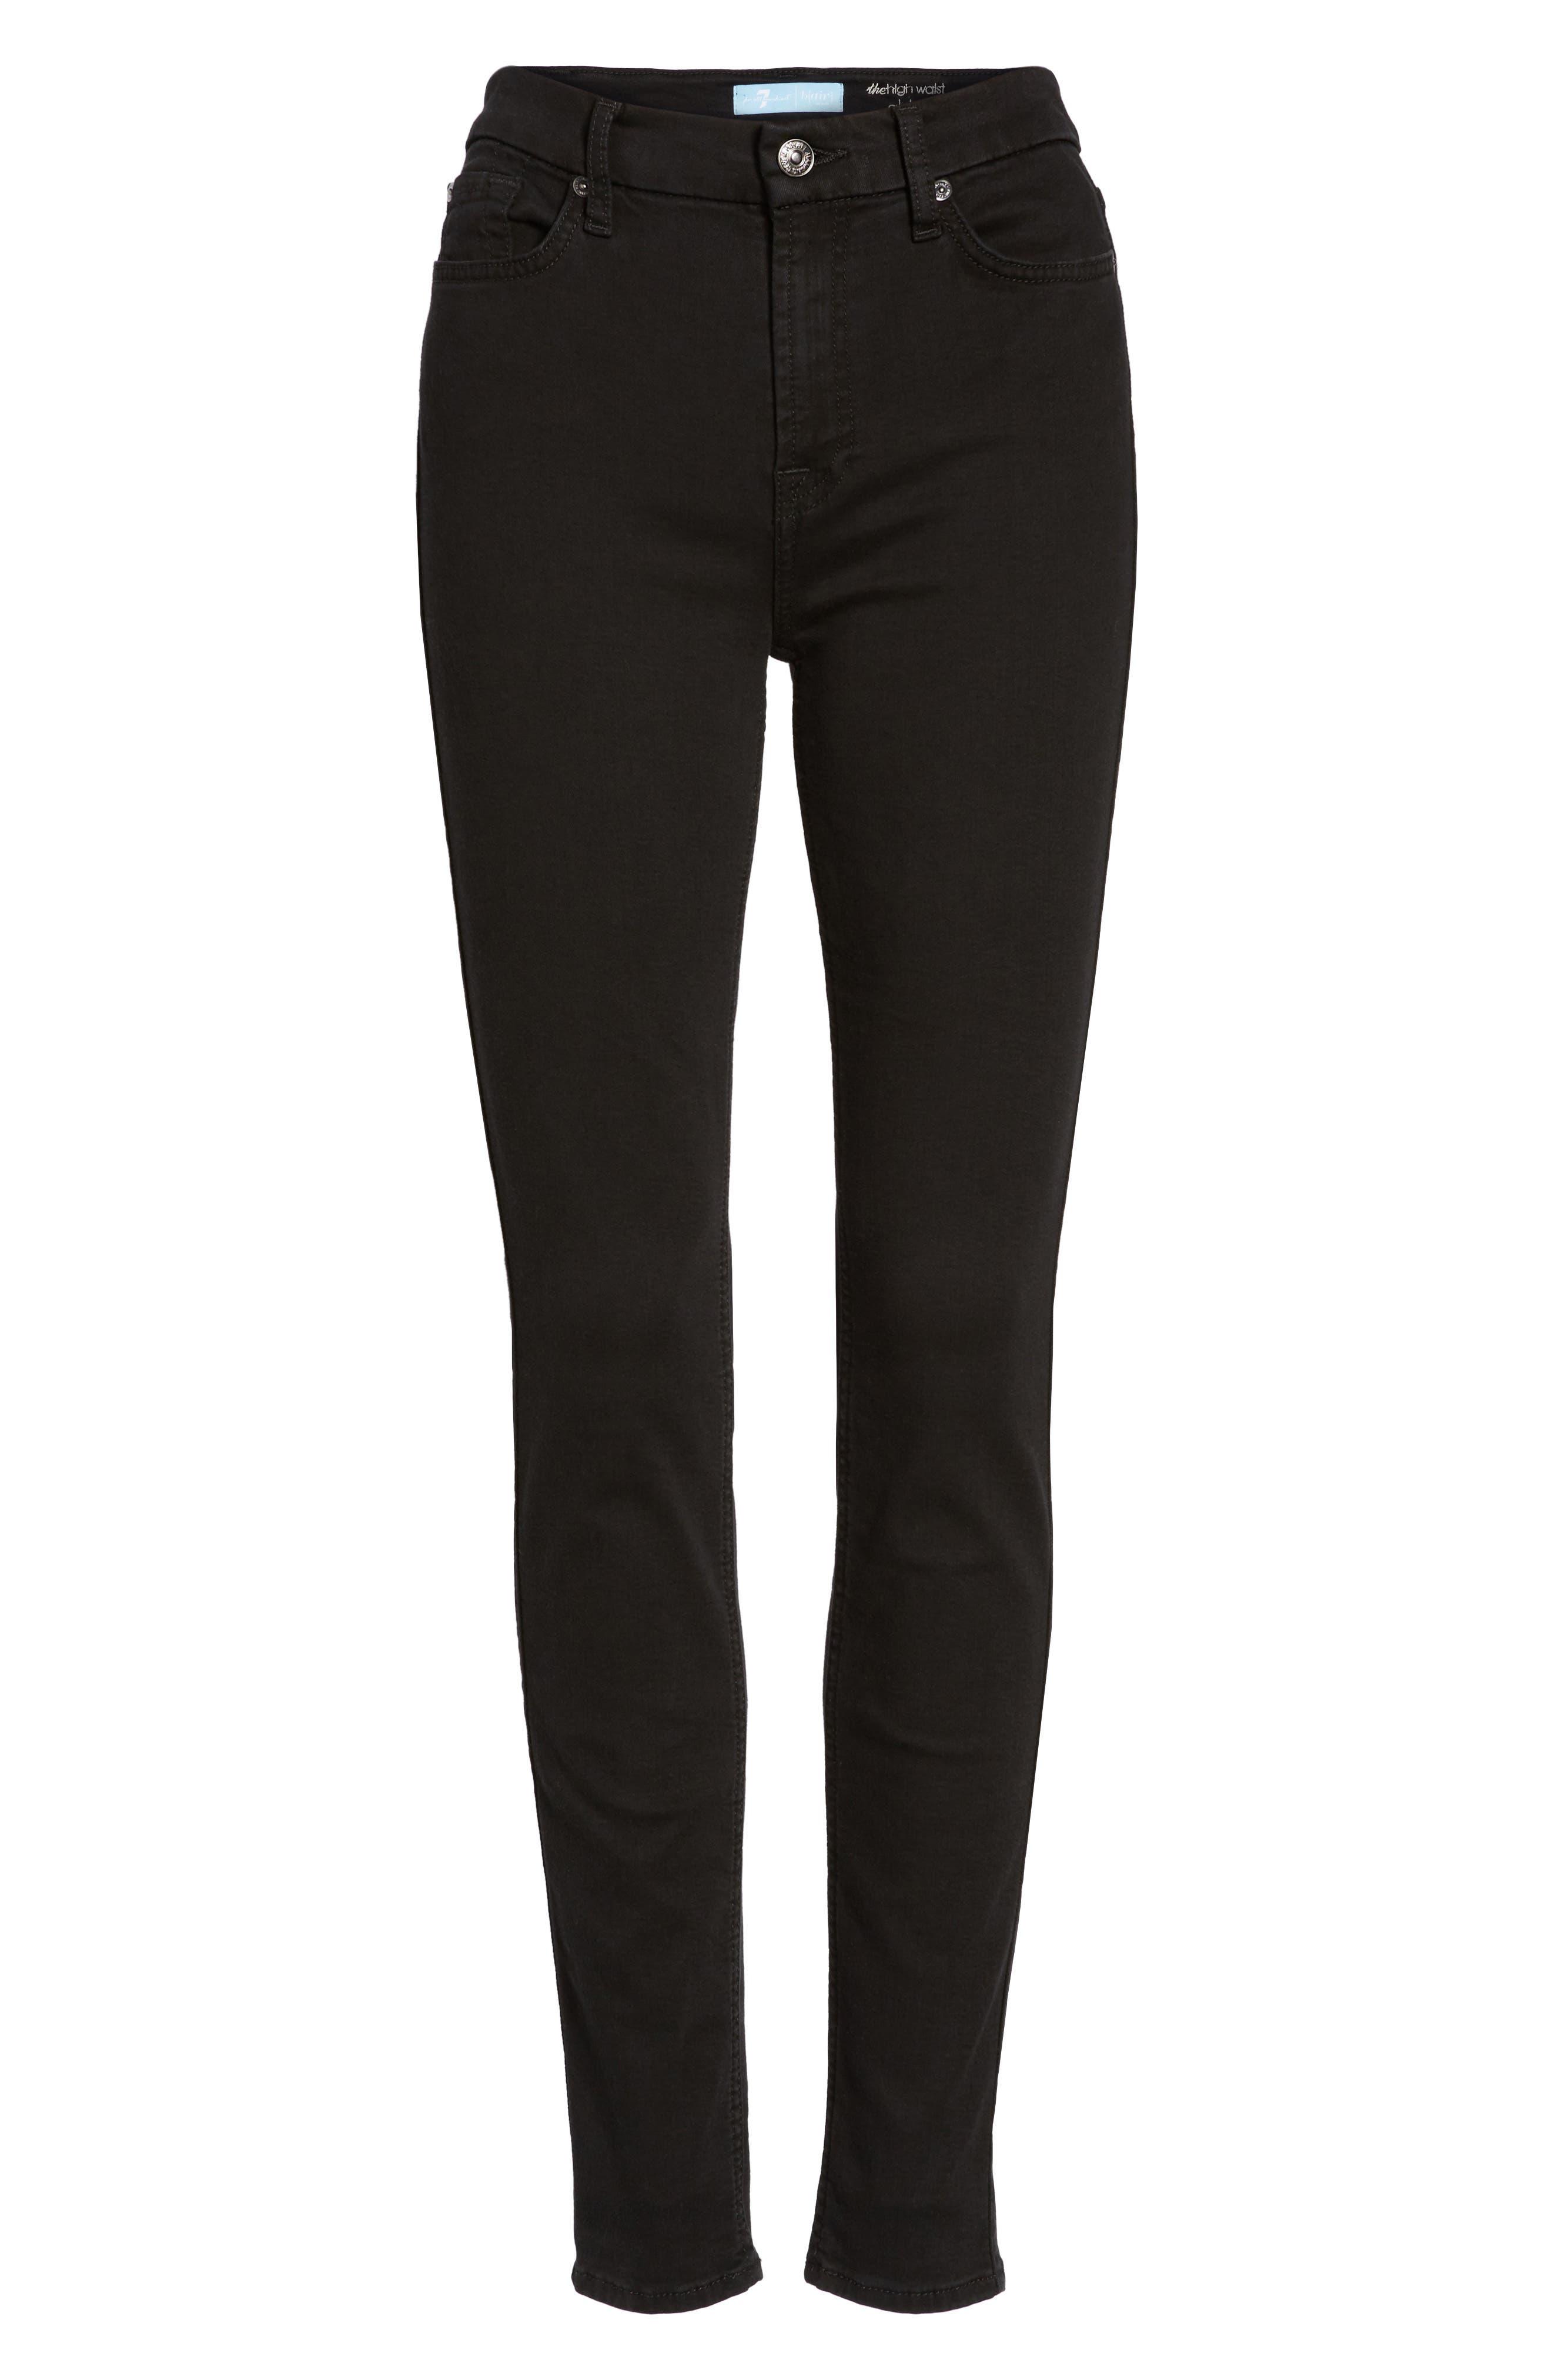 b(air) High Waist Skinny Jeans,                             Alternate thumbnail 7, color,                             B(AIR) BLACK